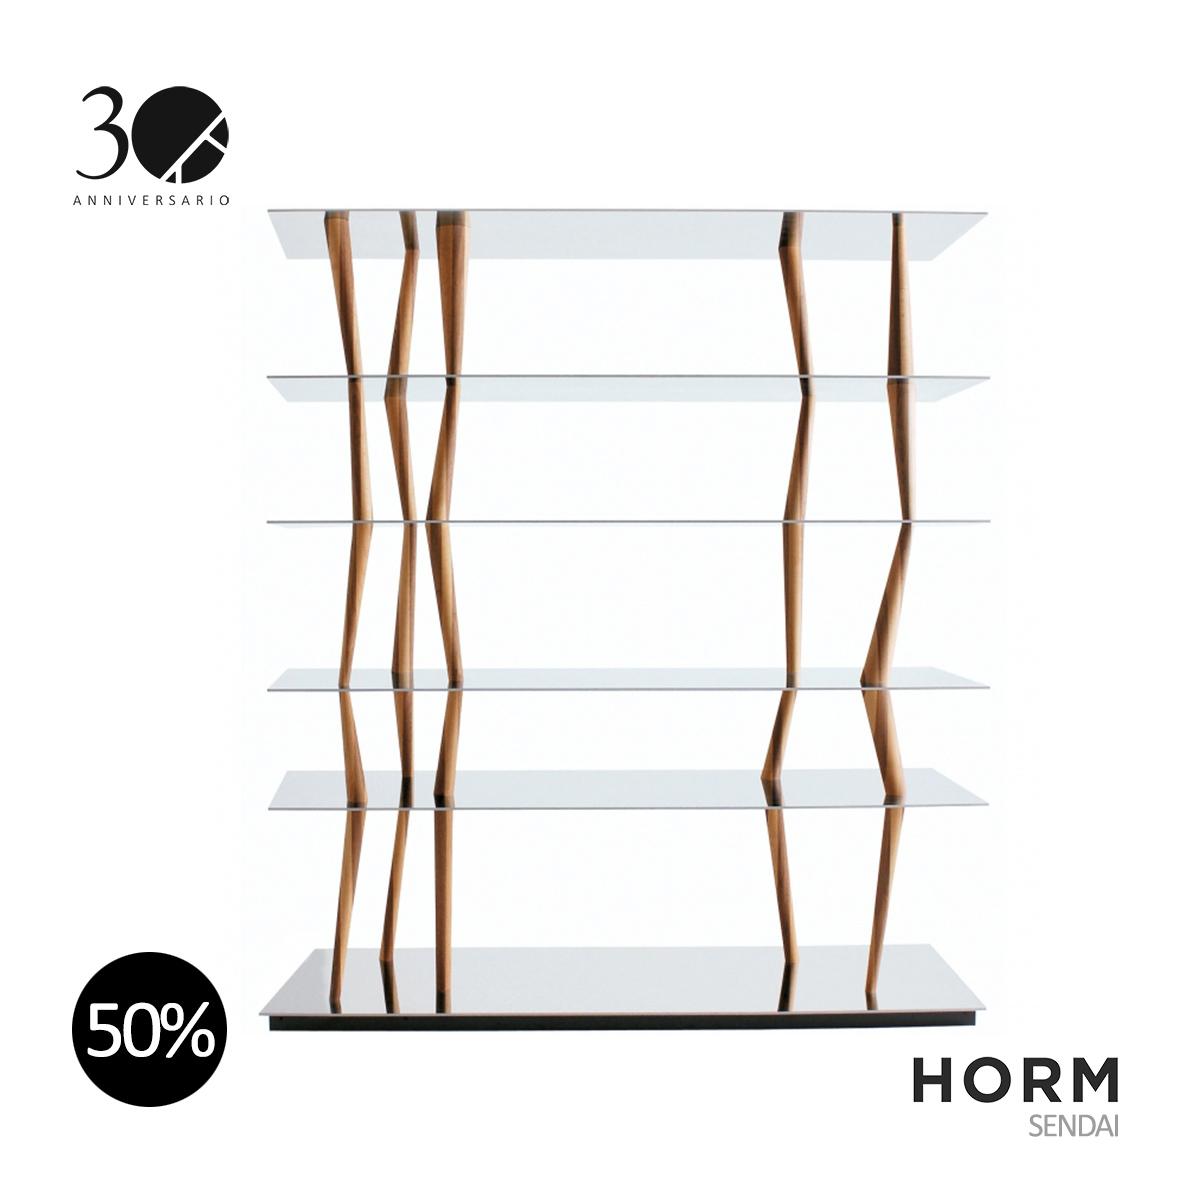 HORM - SENDAI